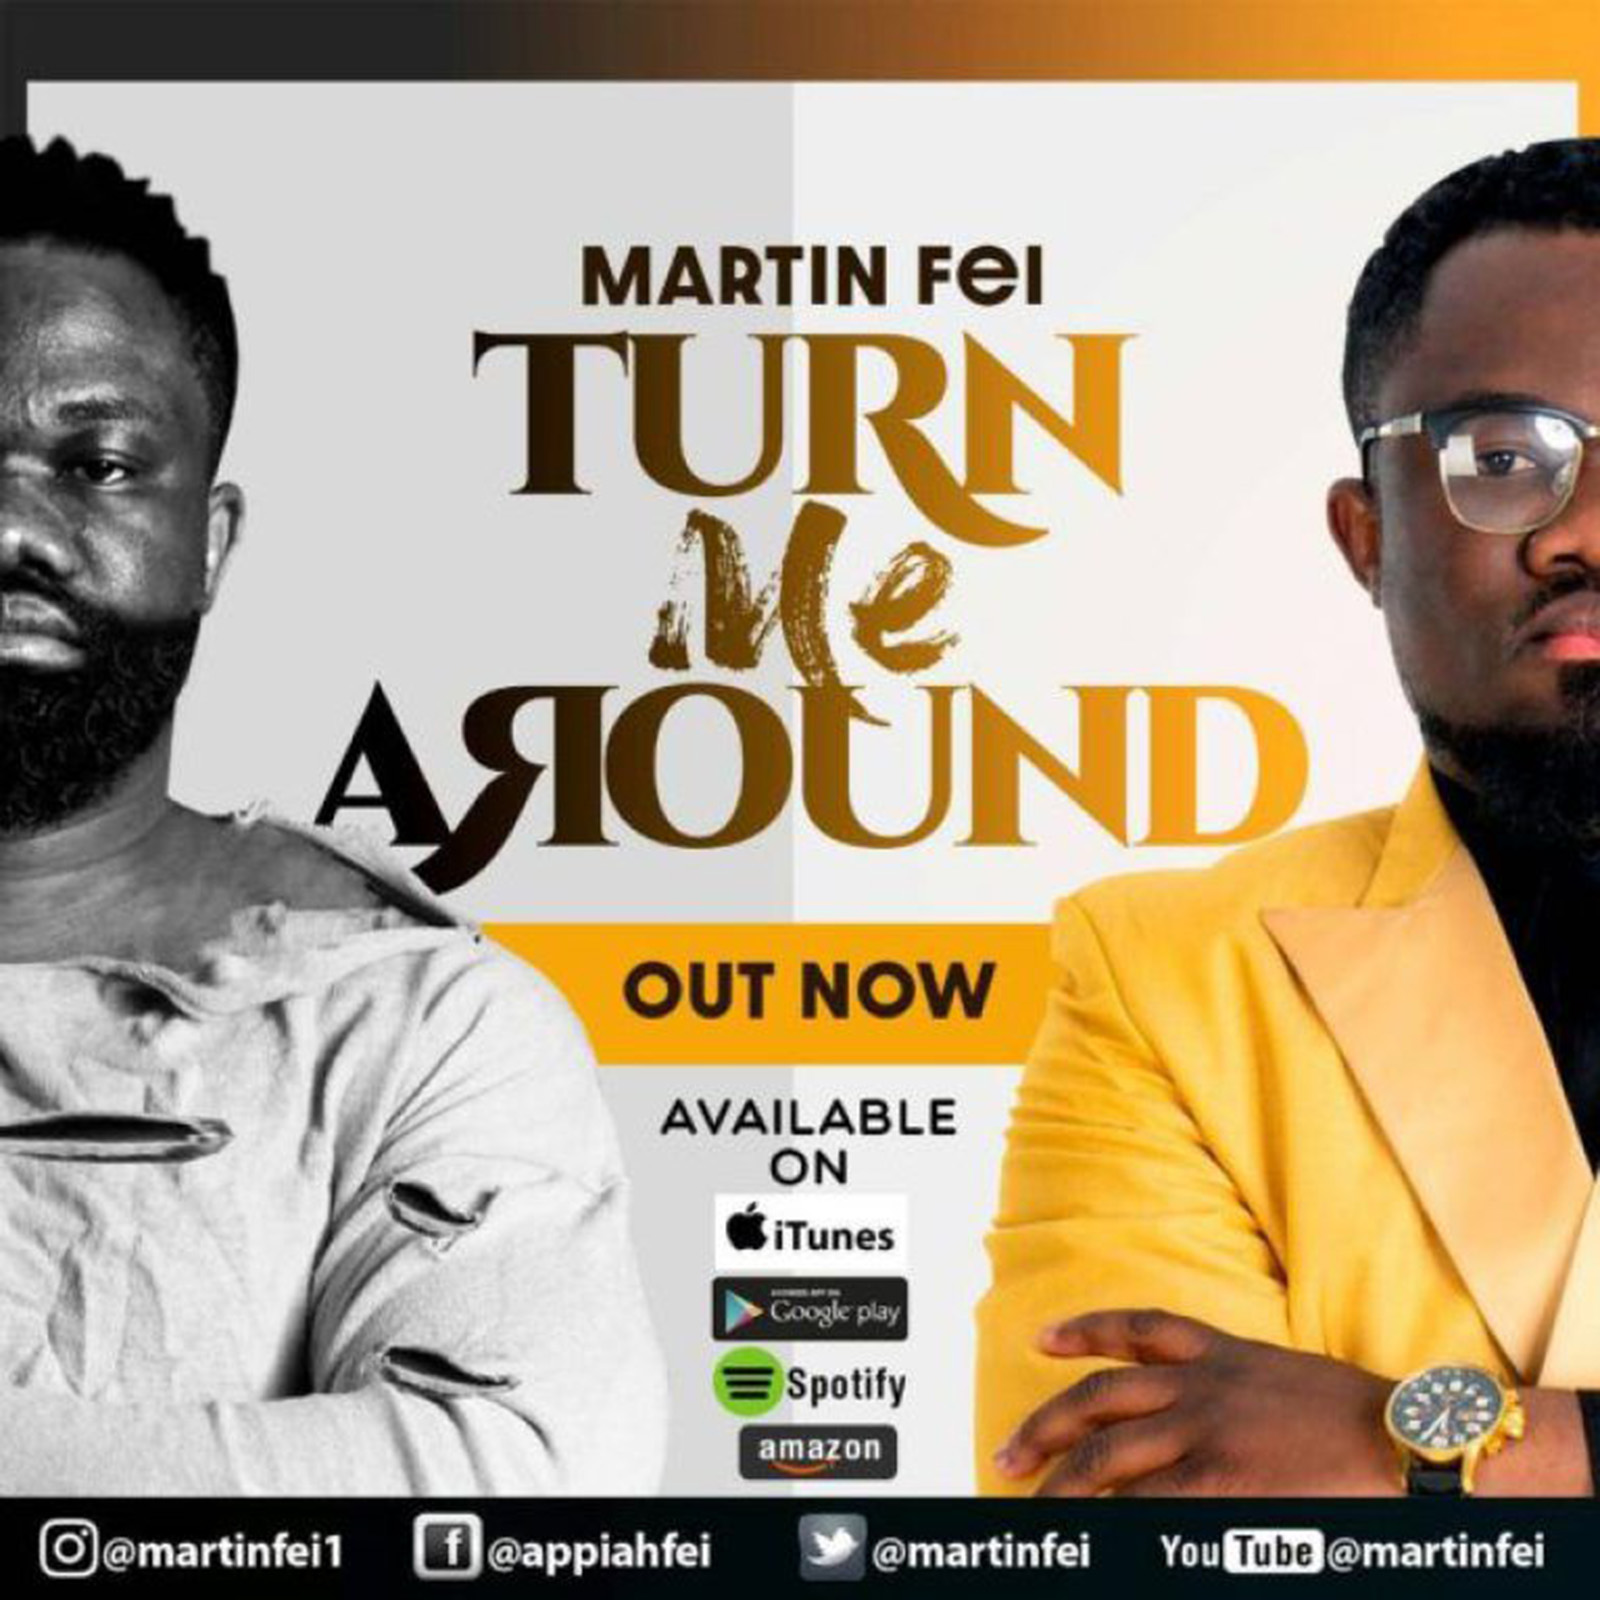 Turn Me Around by Martin Fei